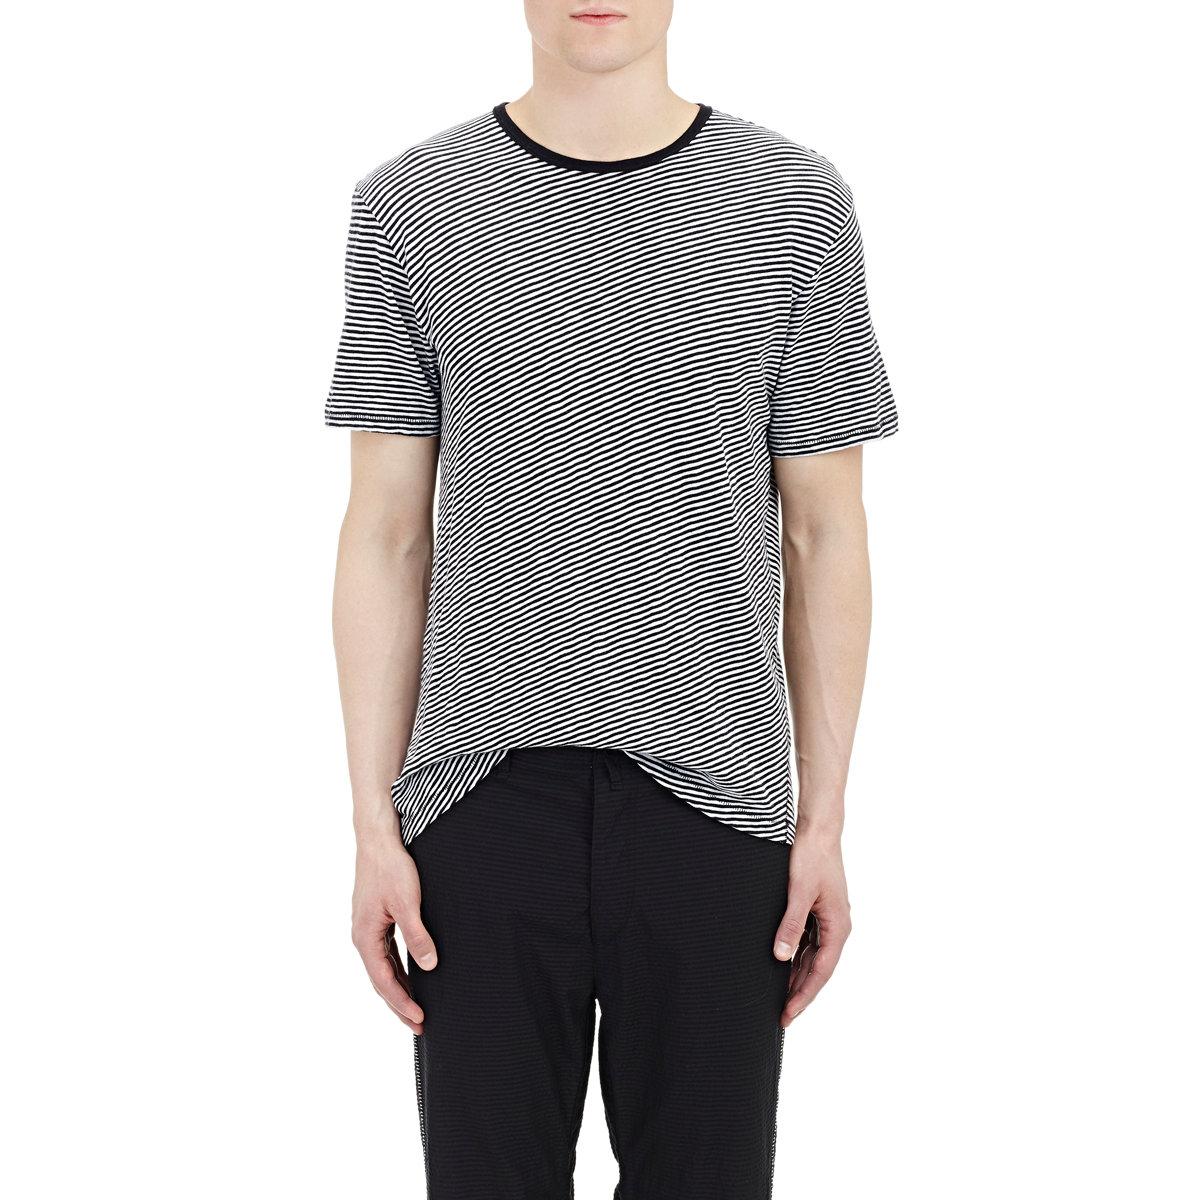 Lyst rag bone rupert t shirt in black for men for Rag and bone t shirts